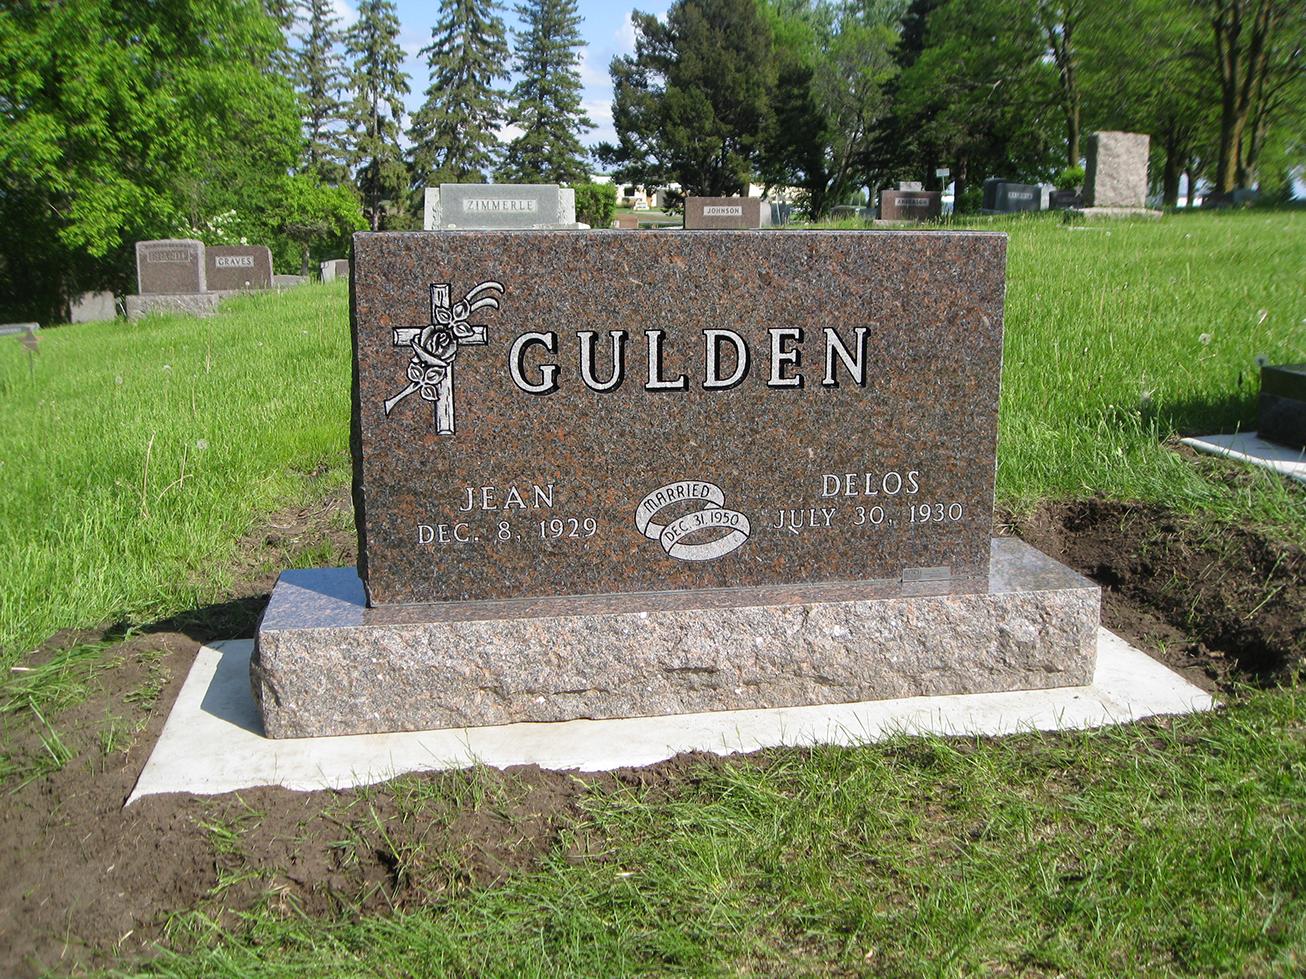 Guldendelos12